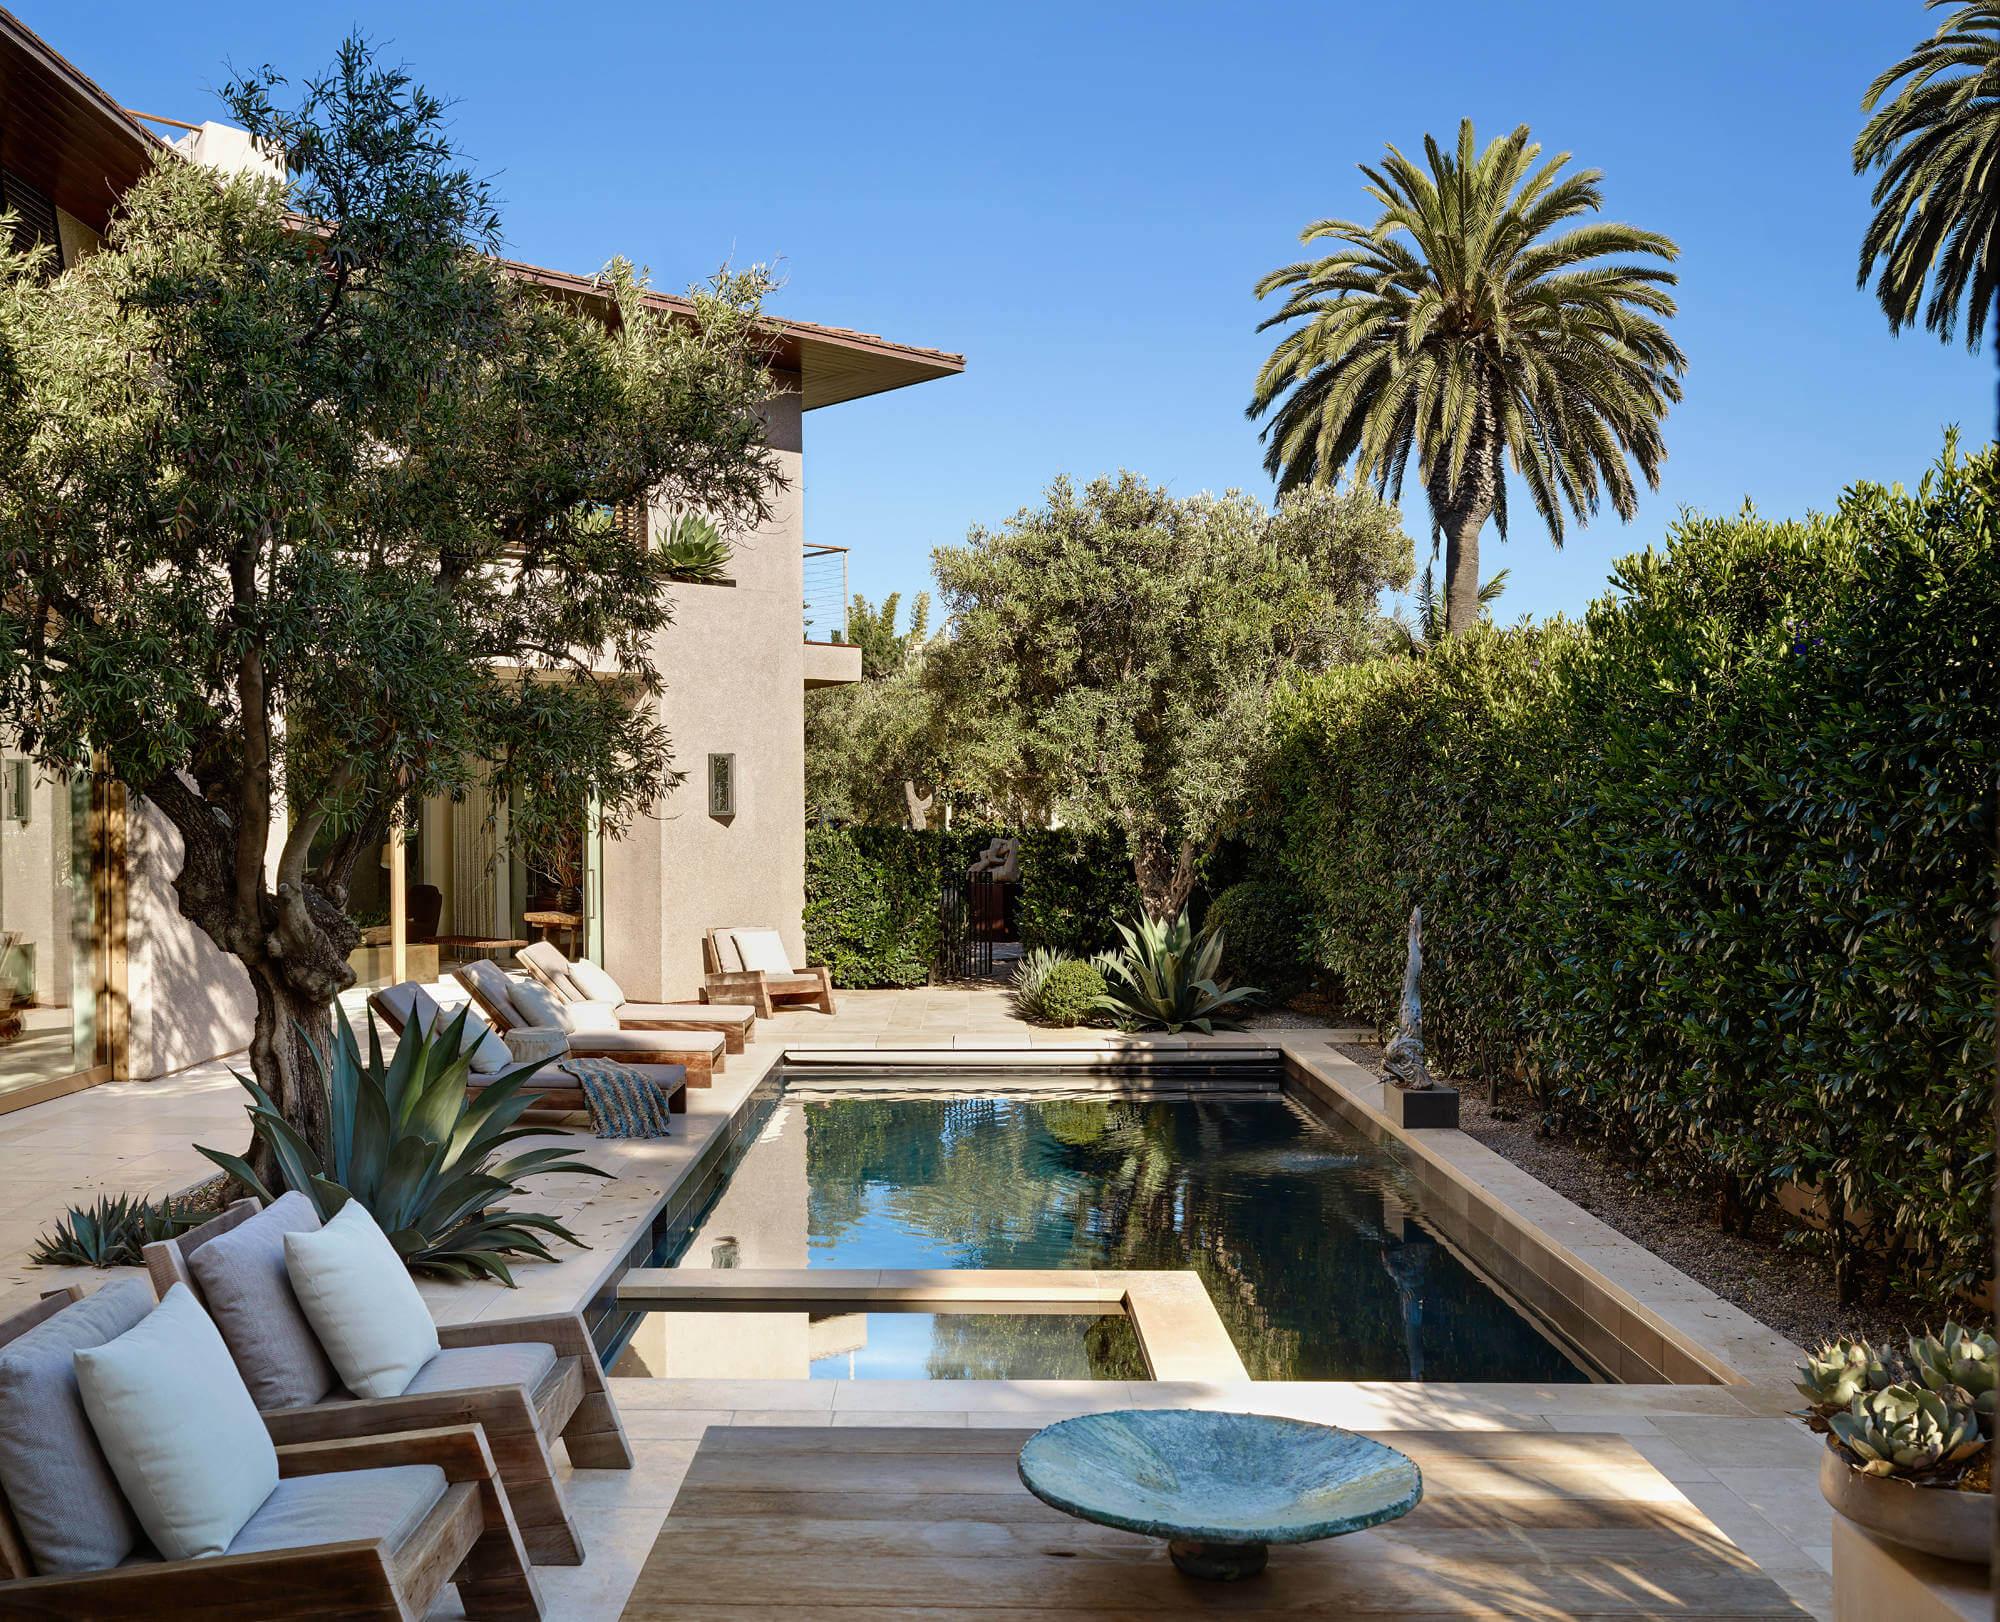 Mediterranean Coronado Residence near San Diego by Island Architects-11